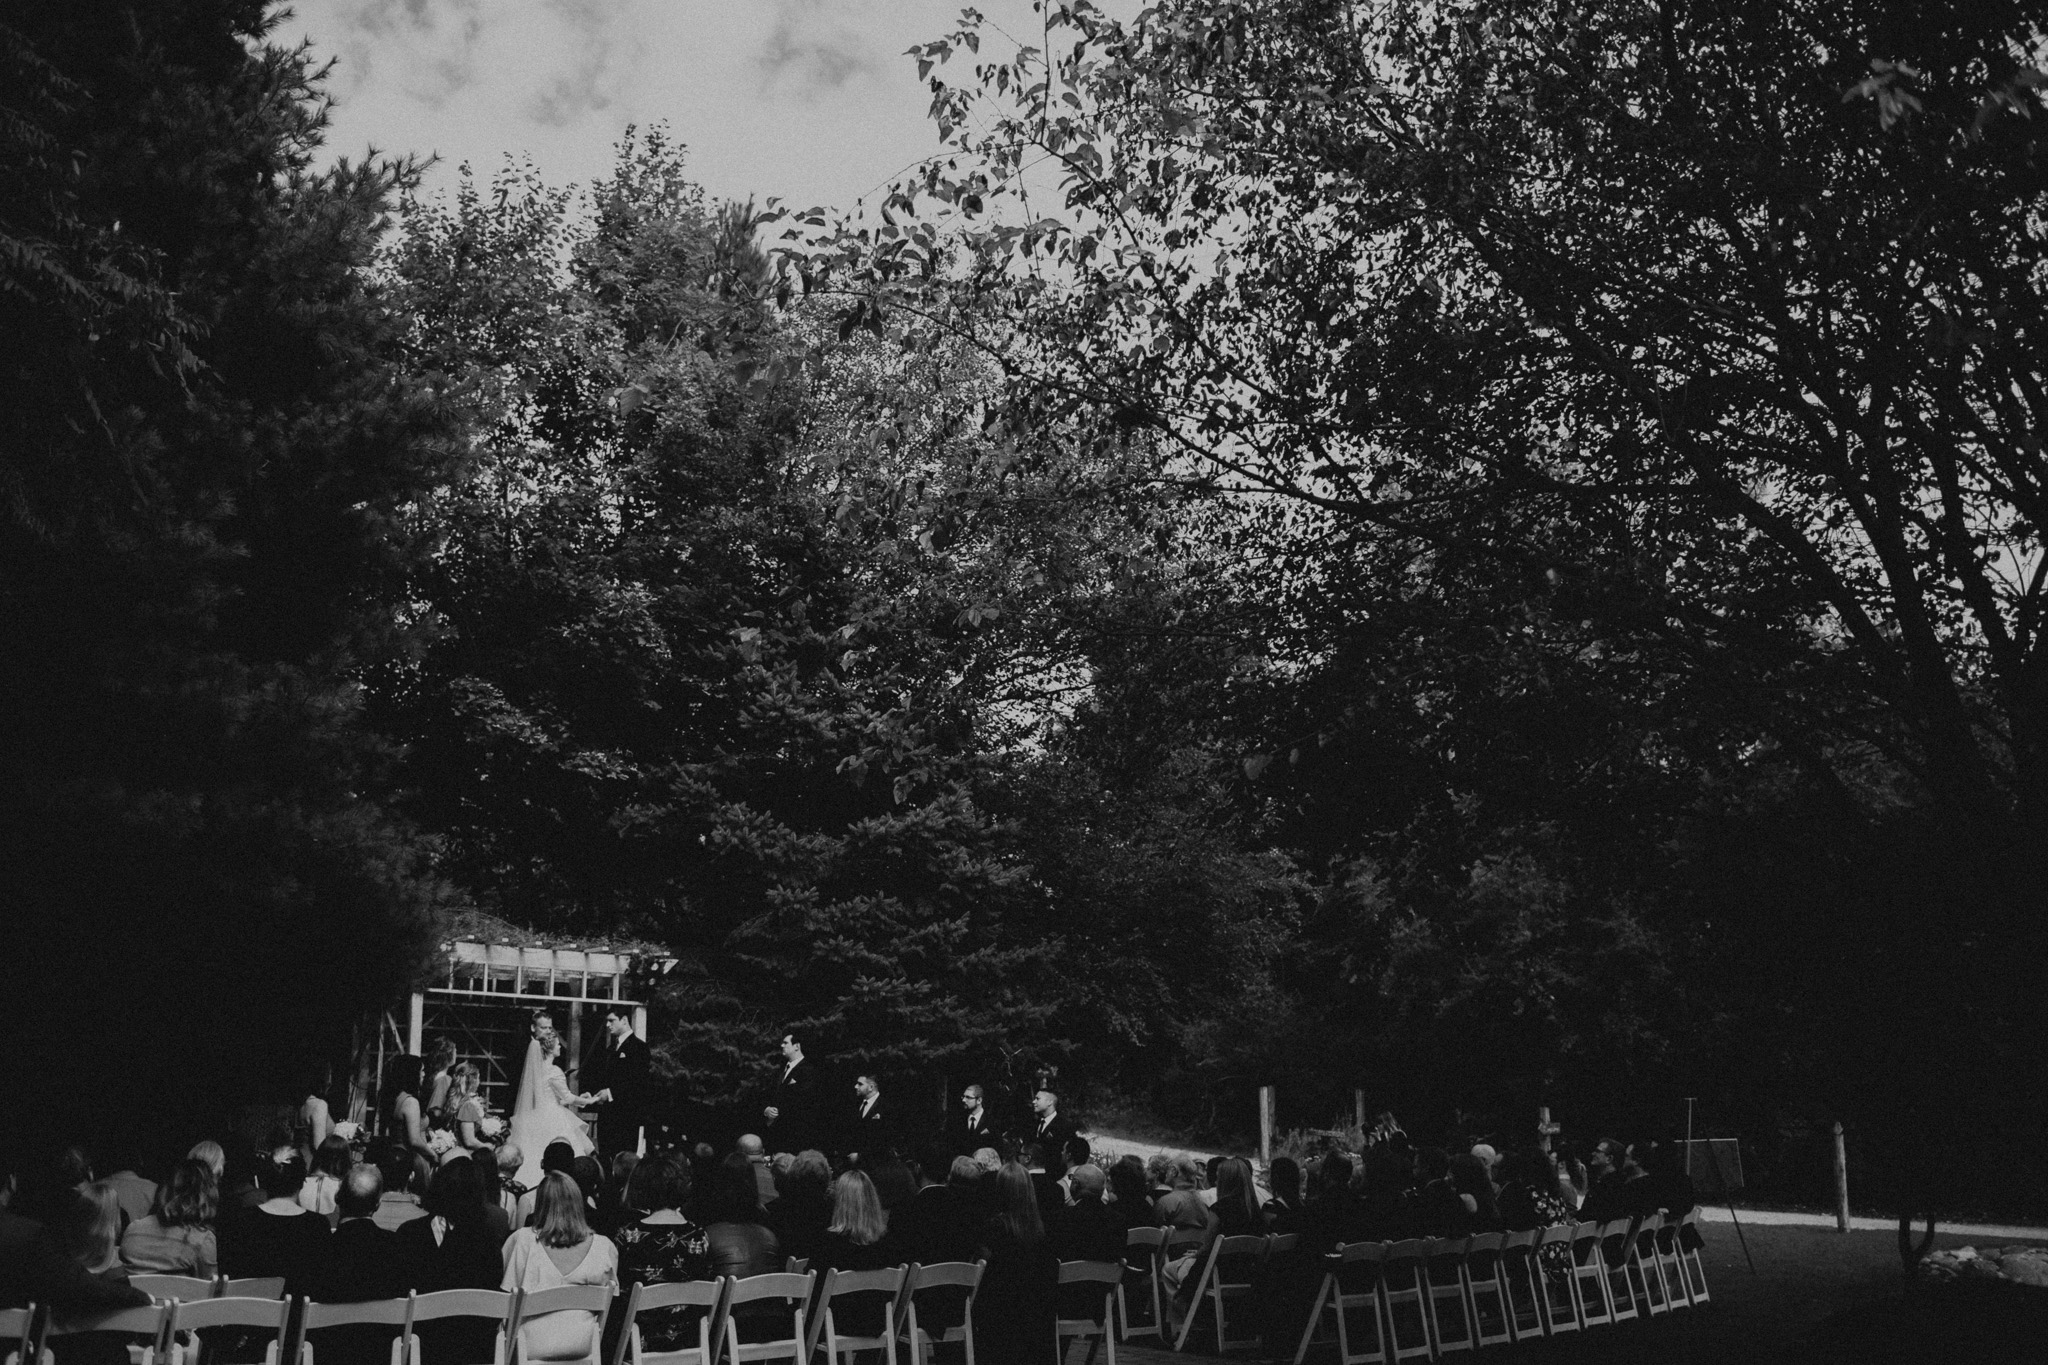 MillCreek-Wilde-Wedding-Barn-Michigan-Eliza-Eric-Vafa-Photo644.jpg